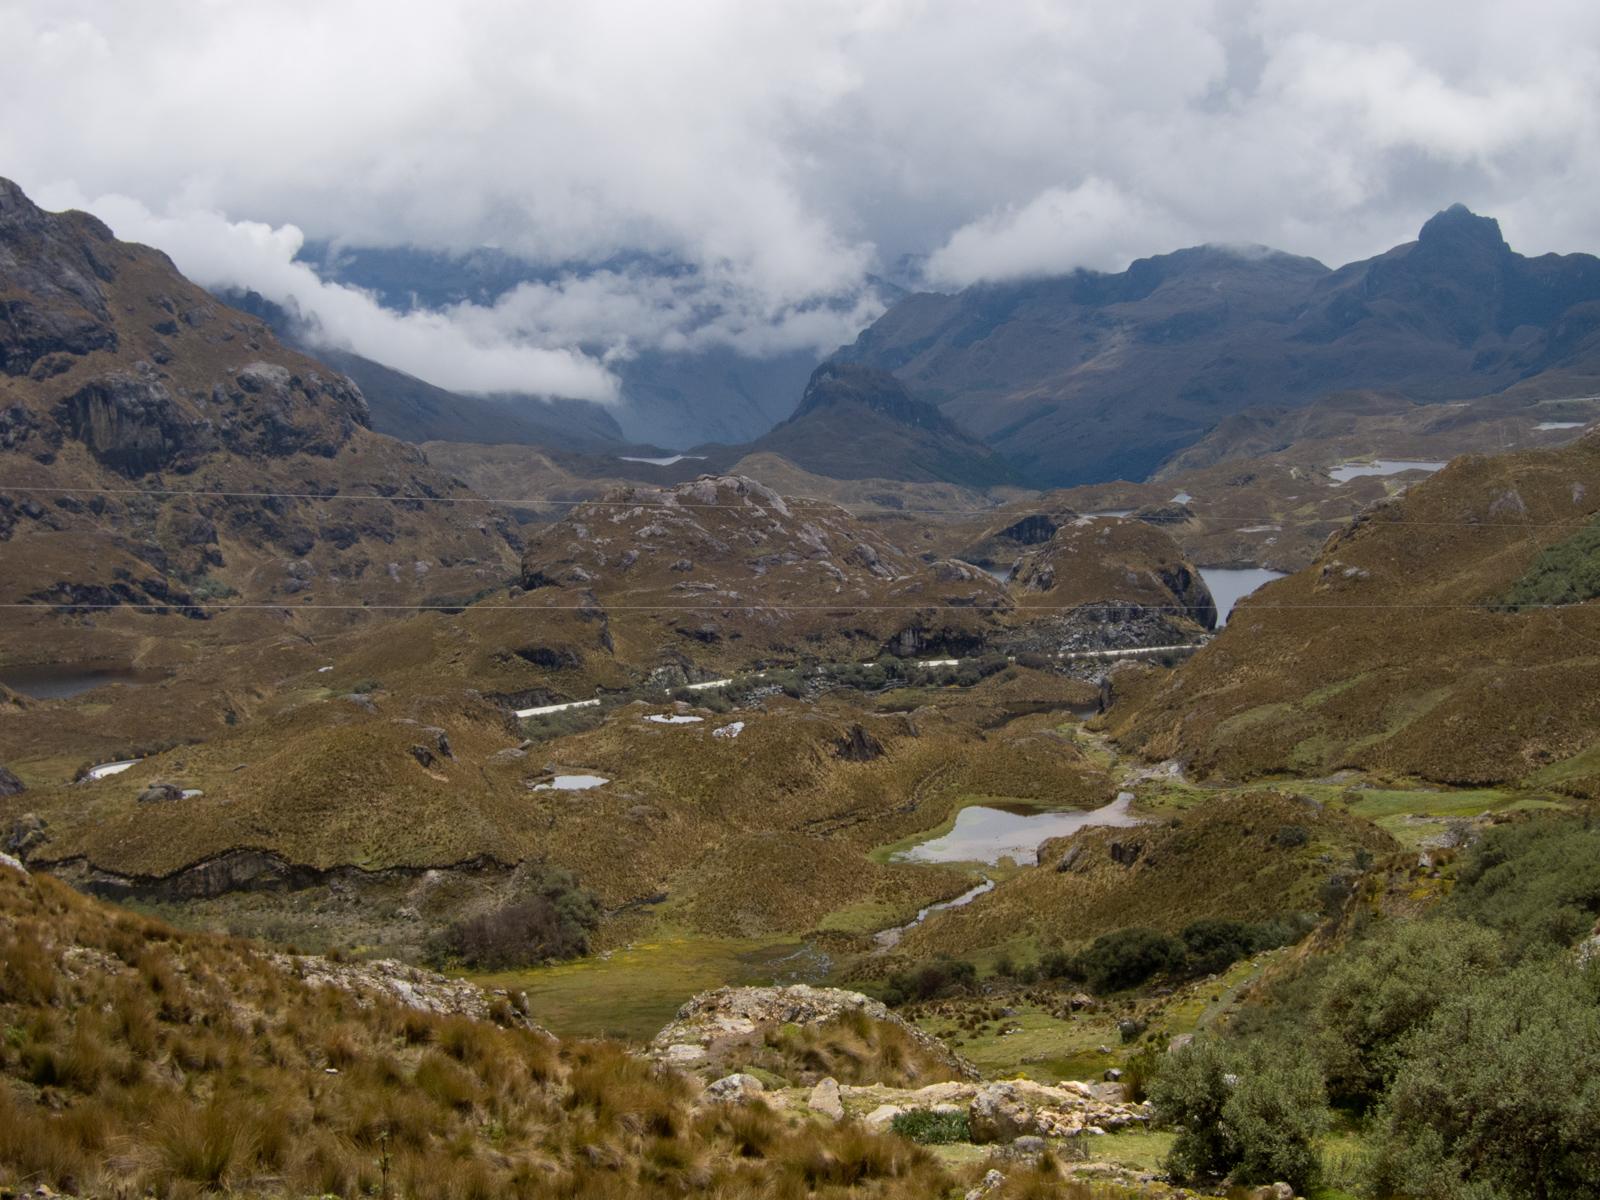 View of El Cajas National Park from 4,100 meters